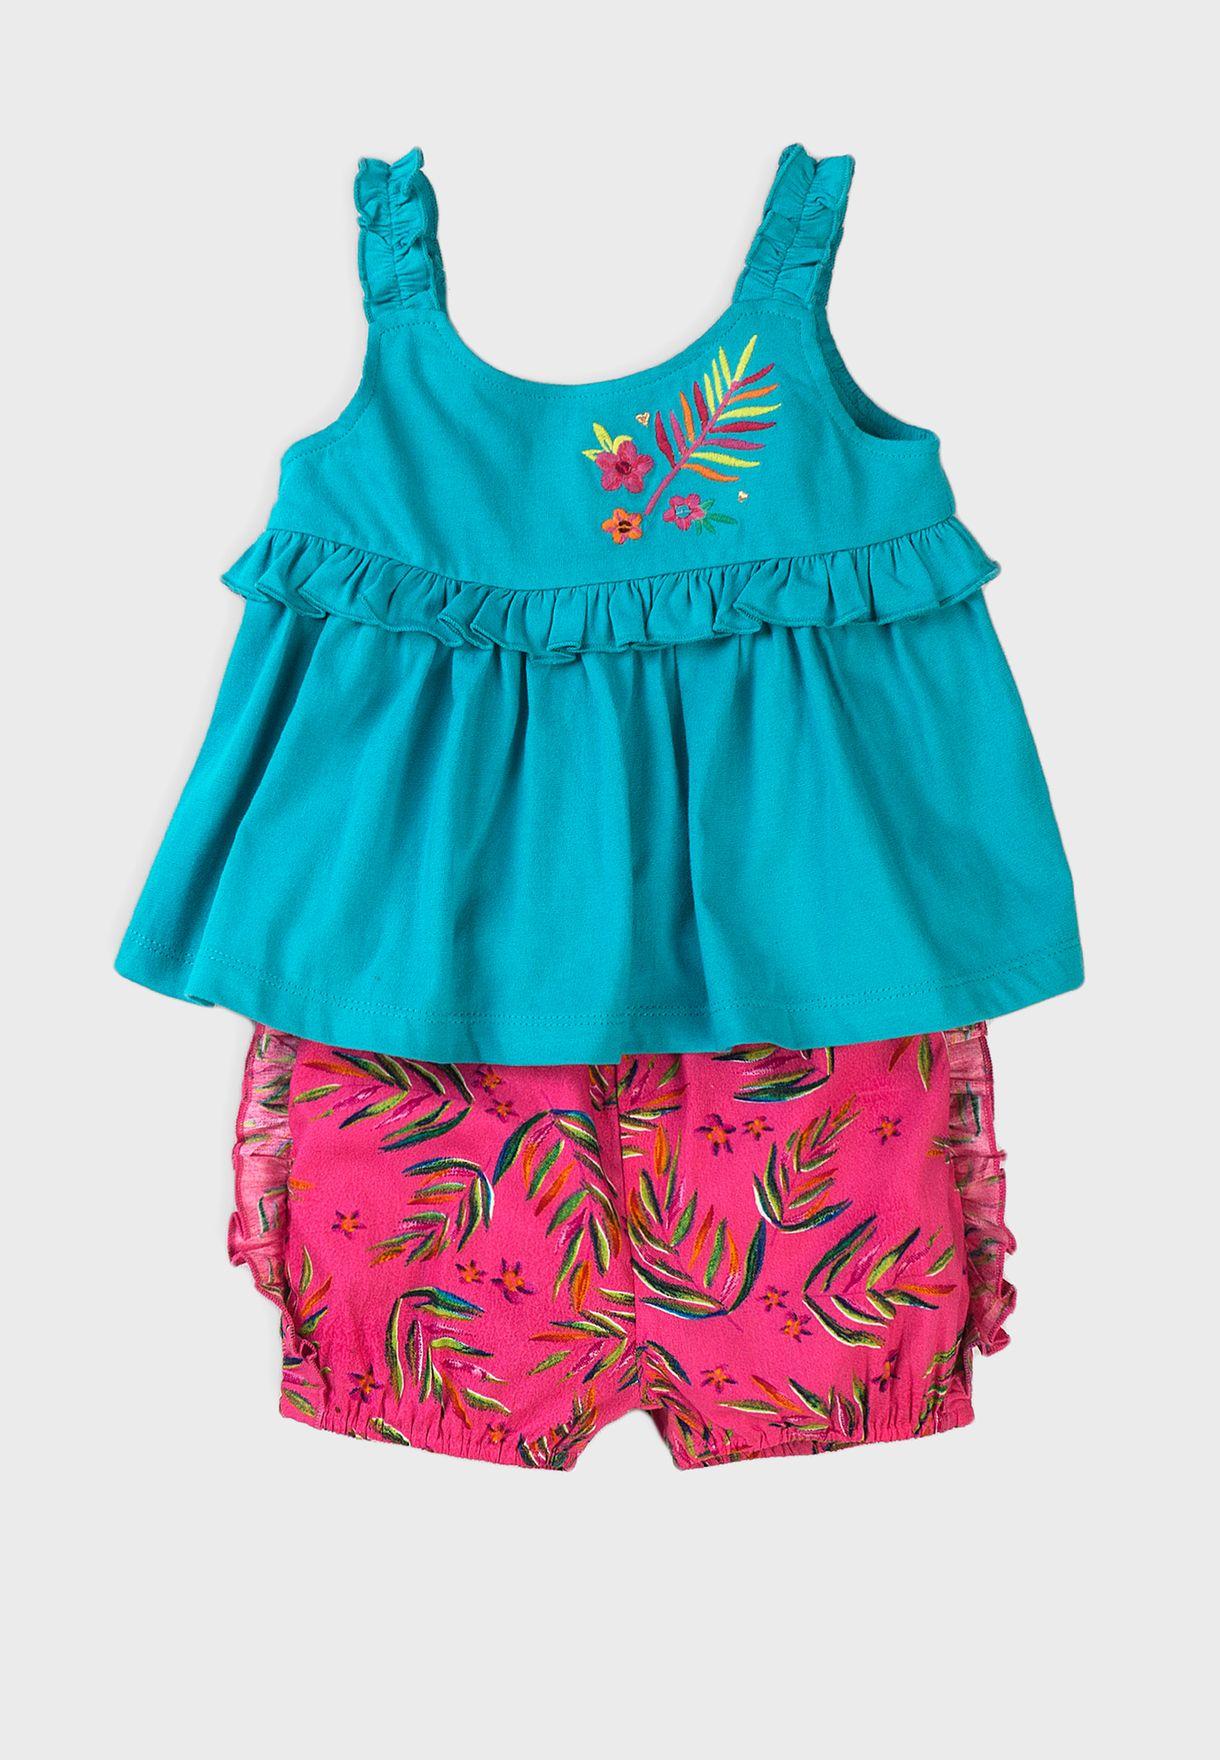 Infant Frill Detail Top + Shorts Set